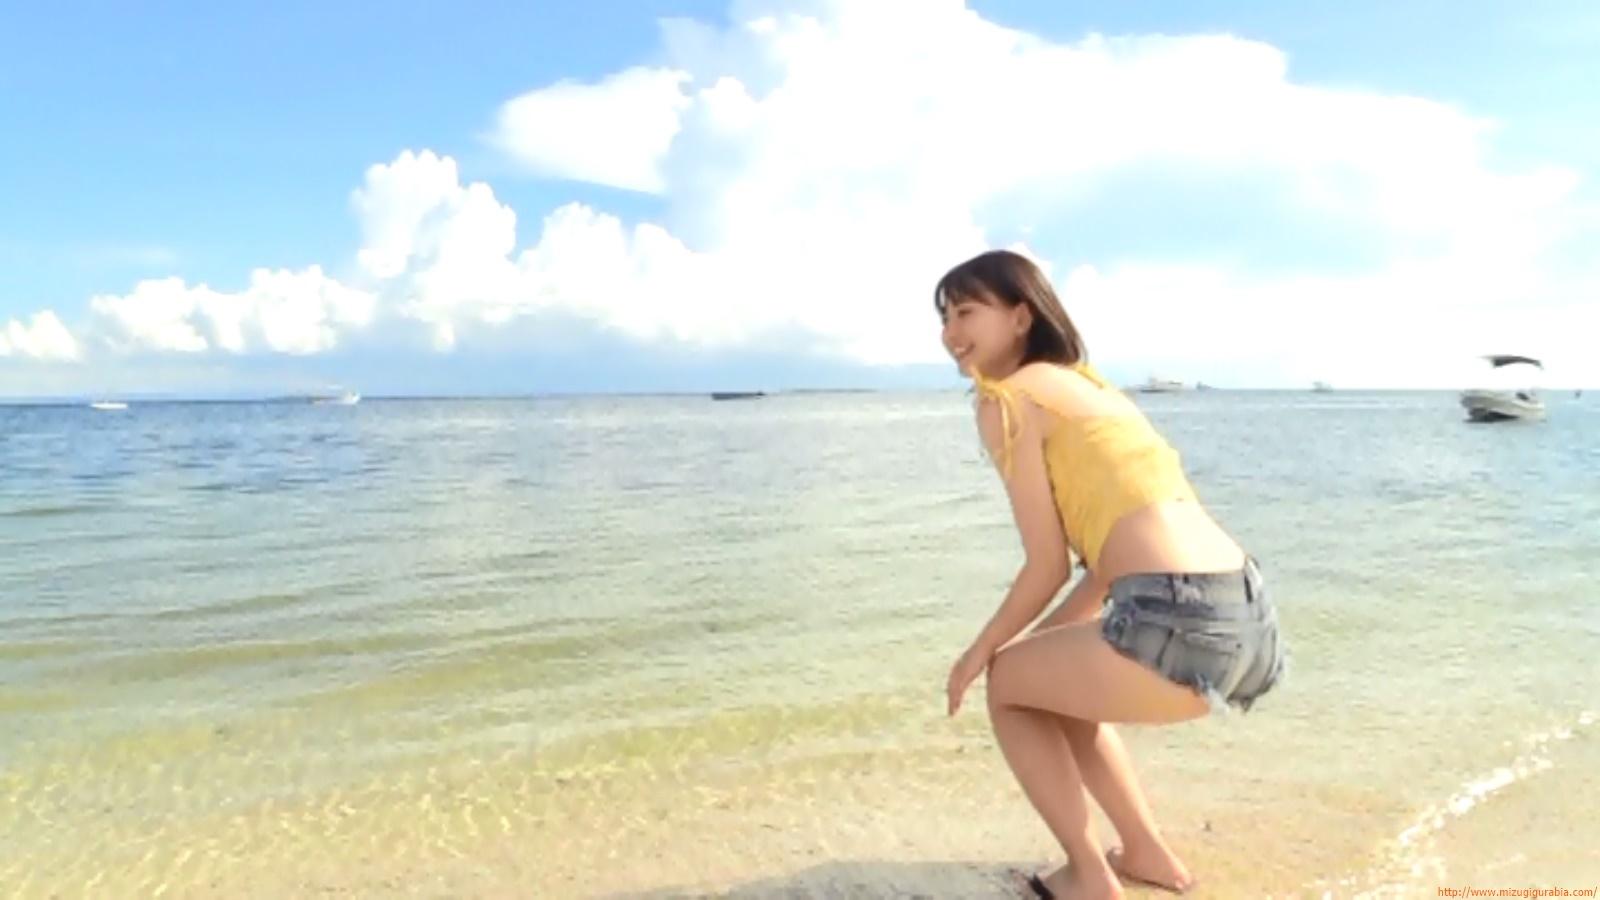 Beach dating072